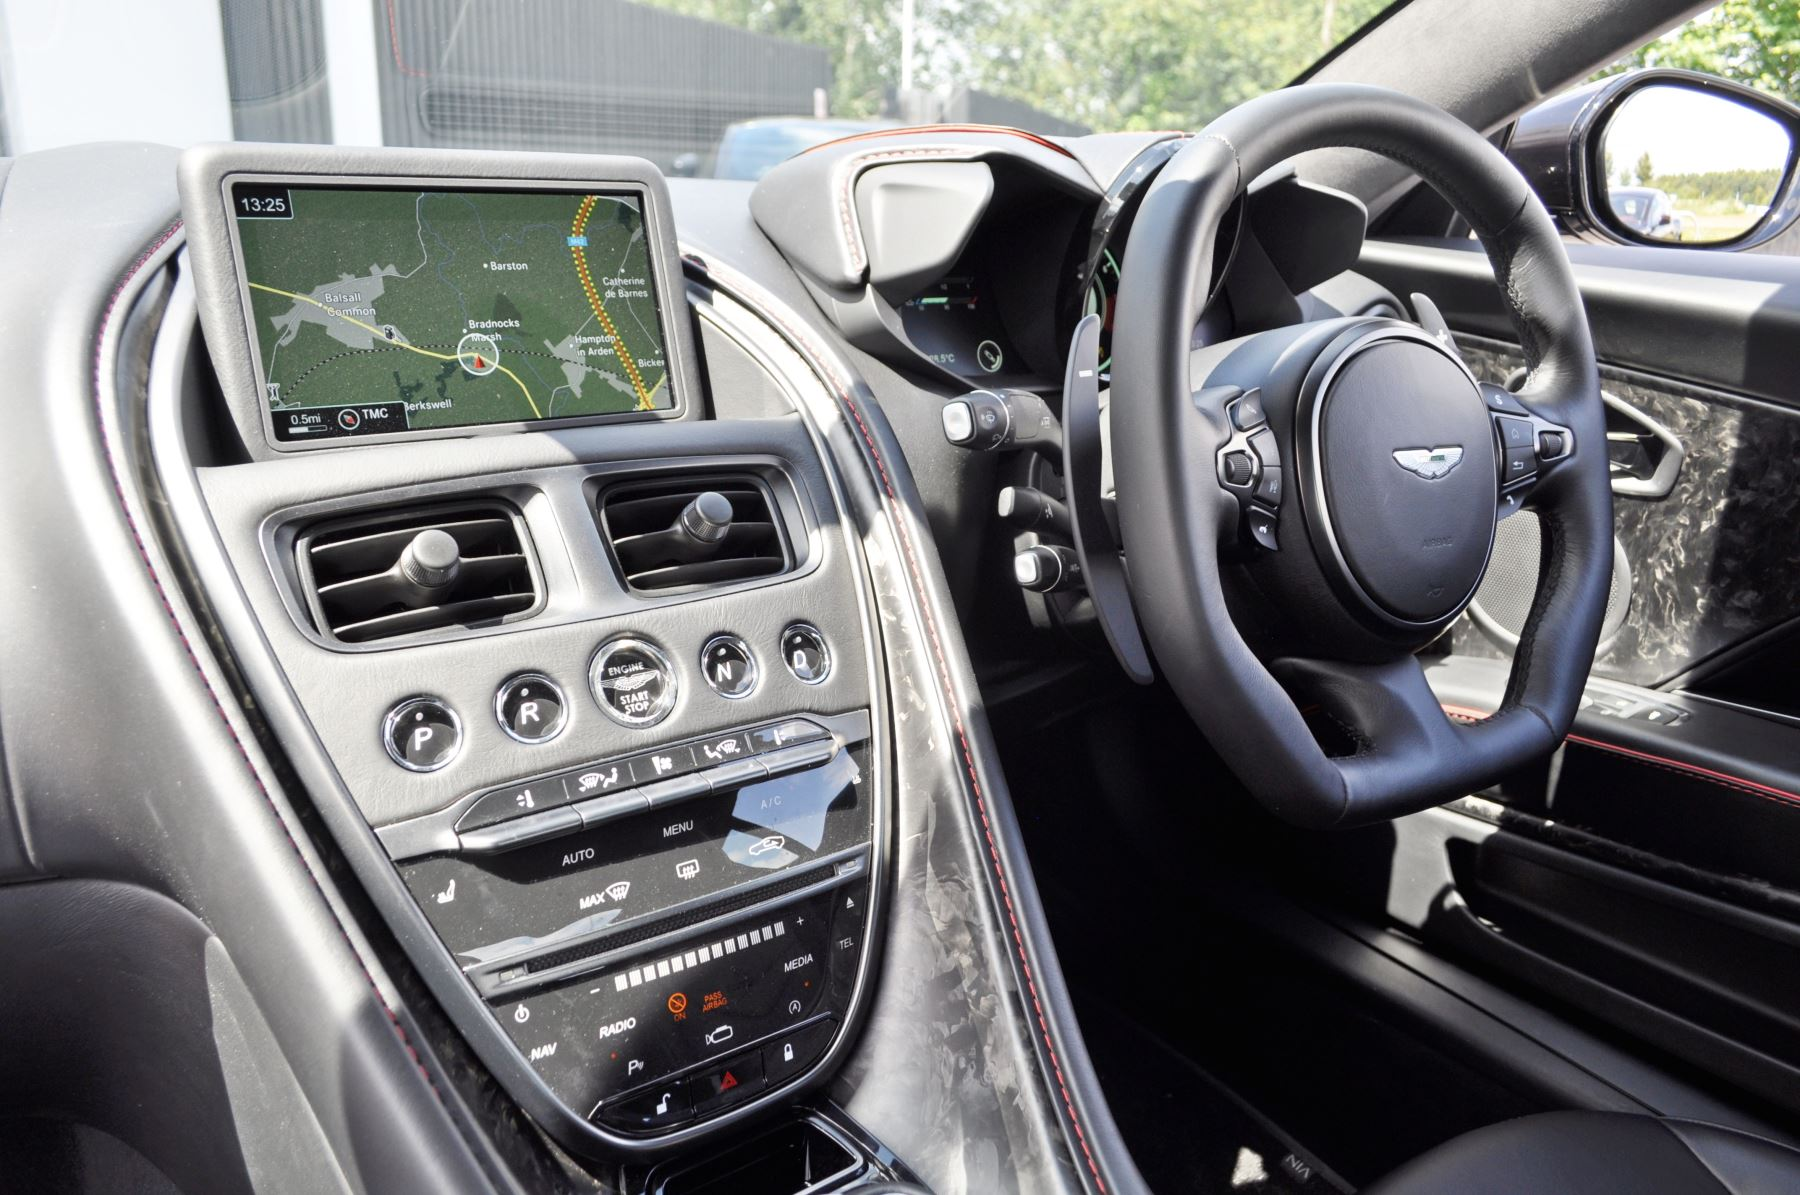 Aston Martin DBS V12 Superleggera Touchtronic image 13